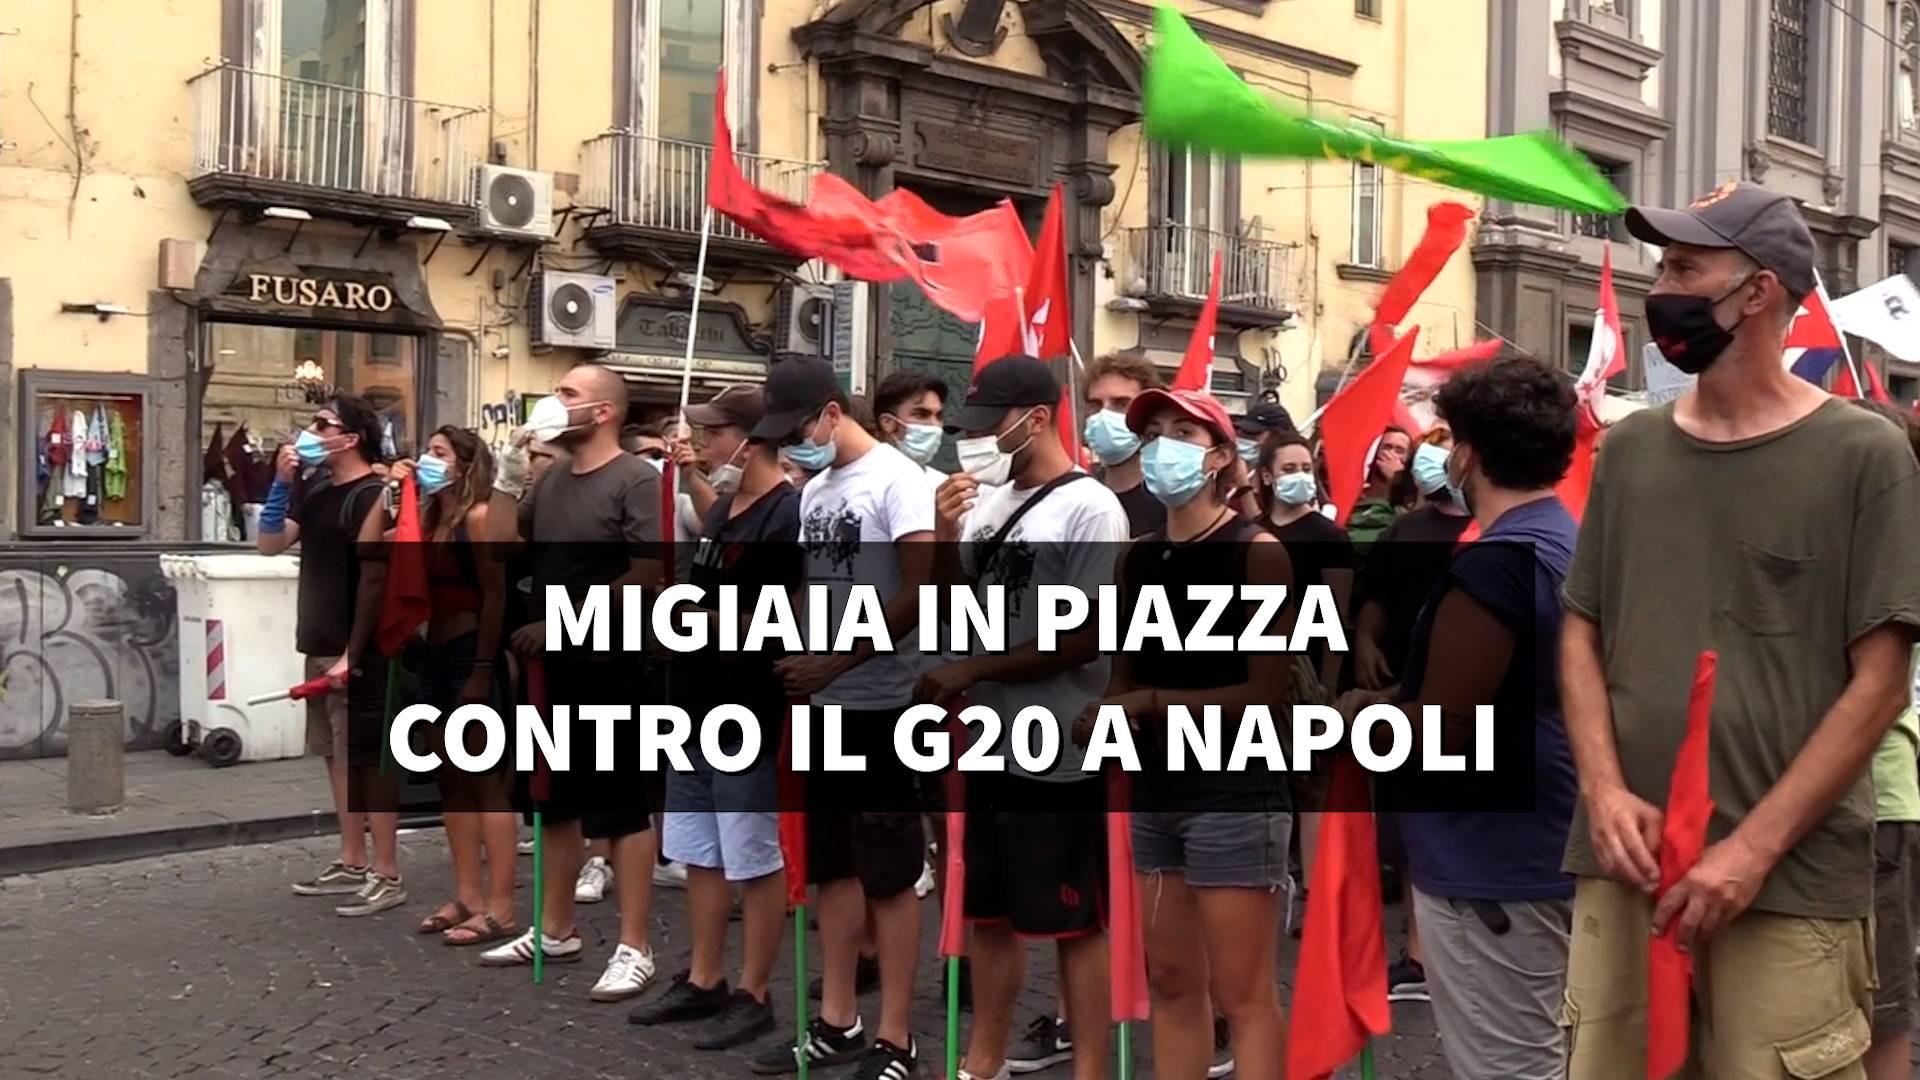 g20 protesta napoli